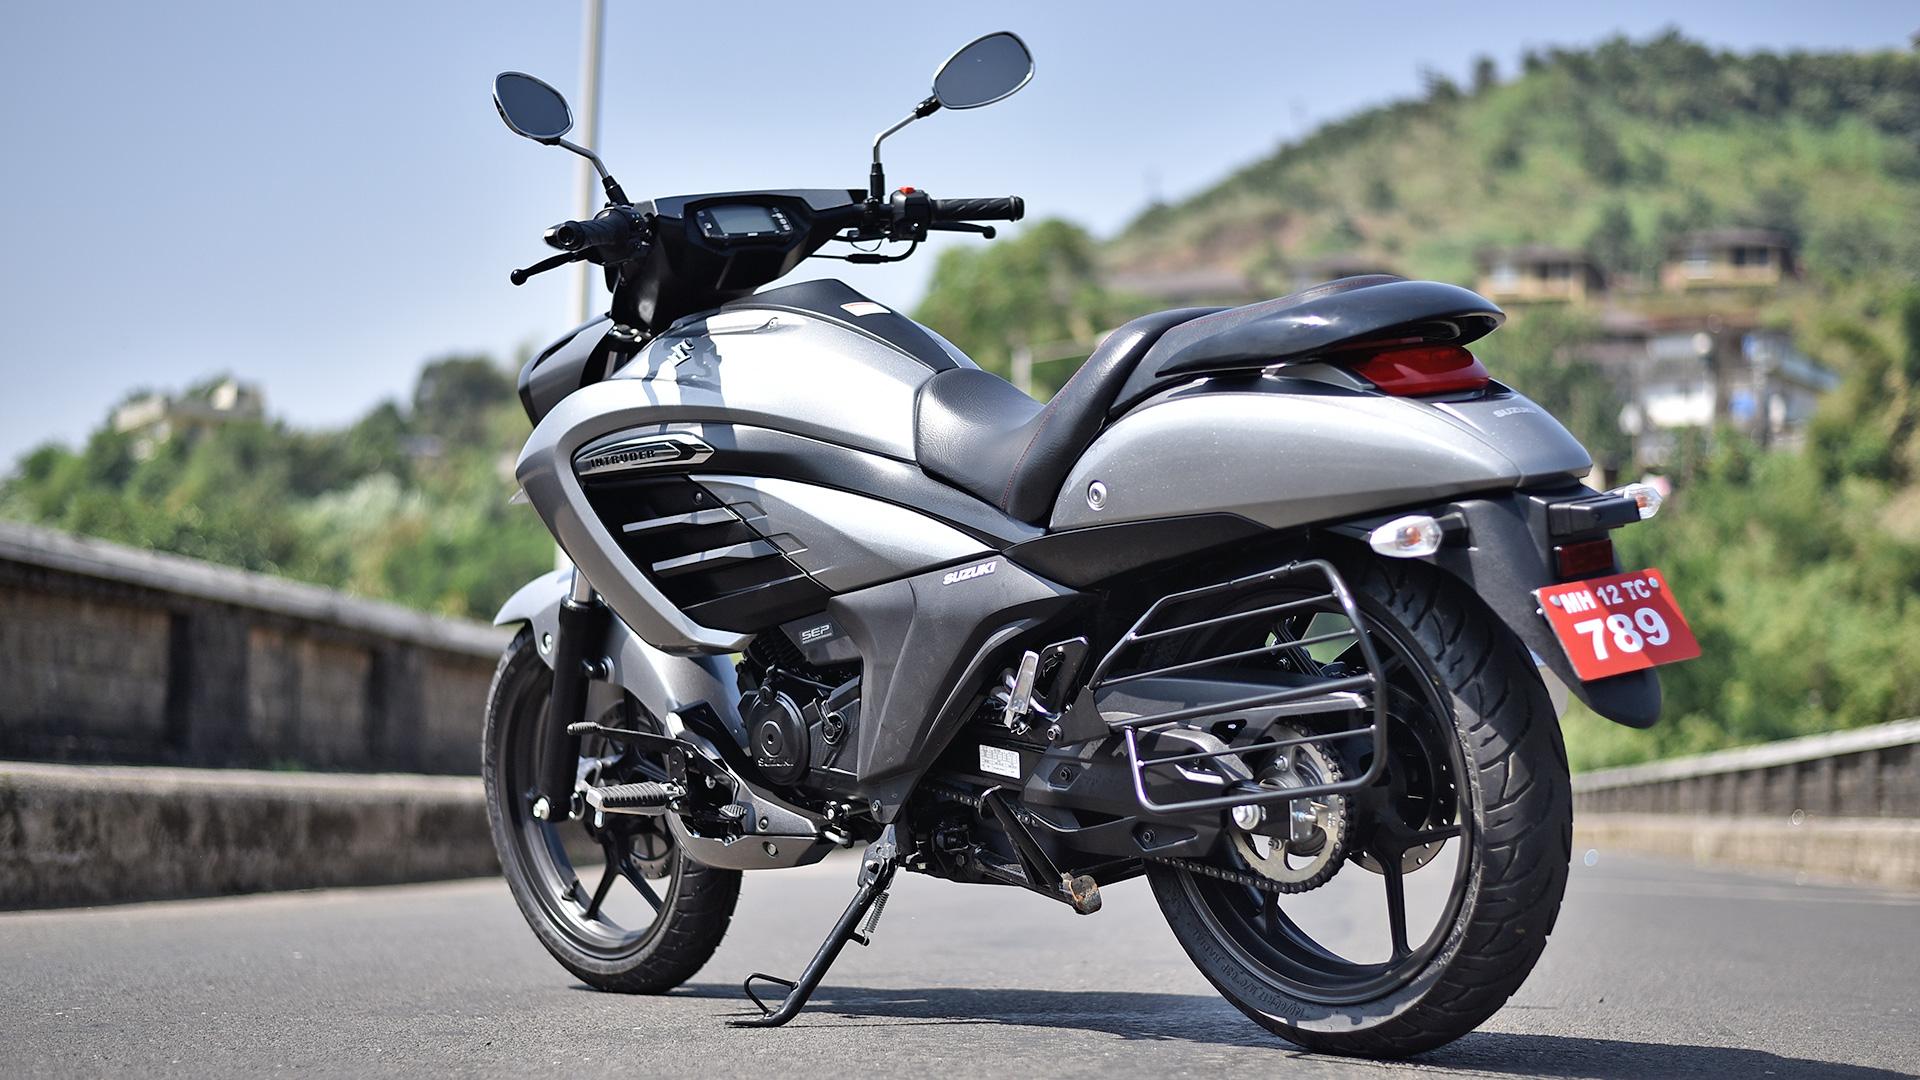 Nueva Suzuki Intruder 155 2019 Velocidadmaximacom